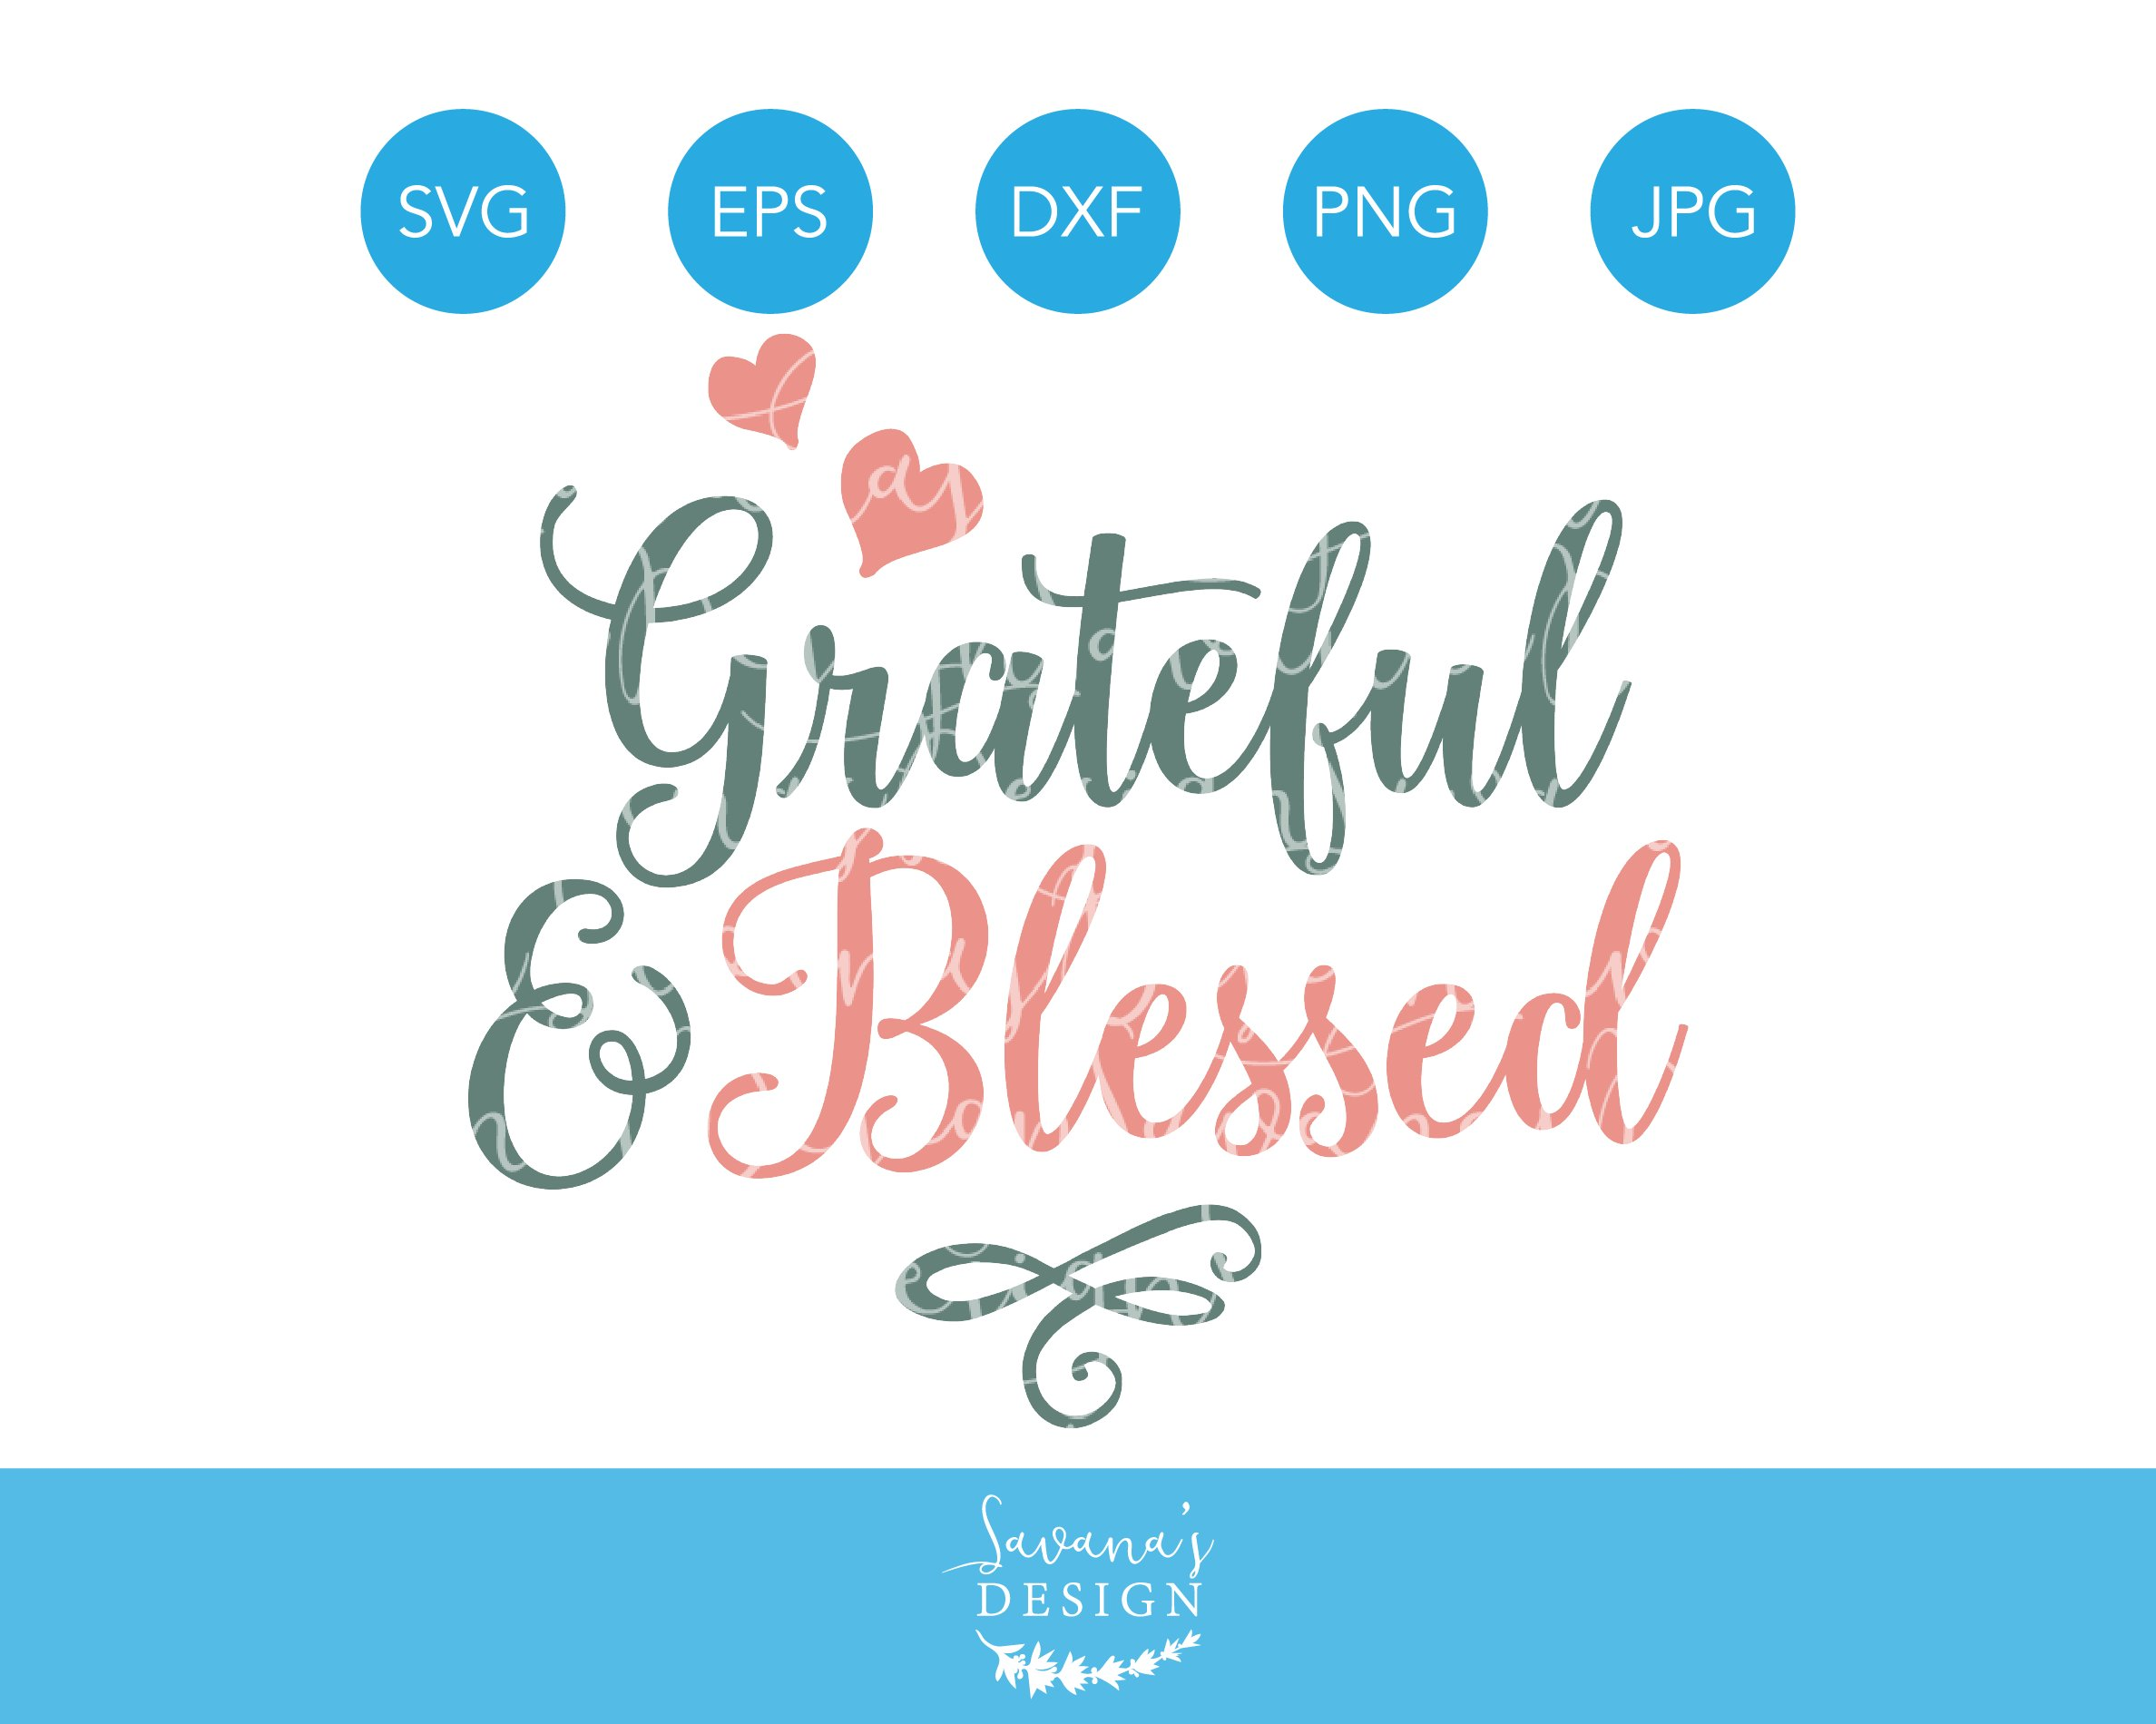 Grateful And Blessed Svg Cut File Pre Designed Illustrator Graphics Creative Market